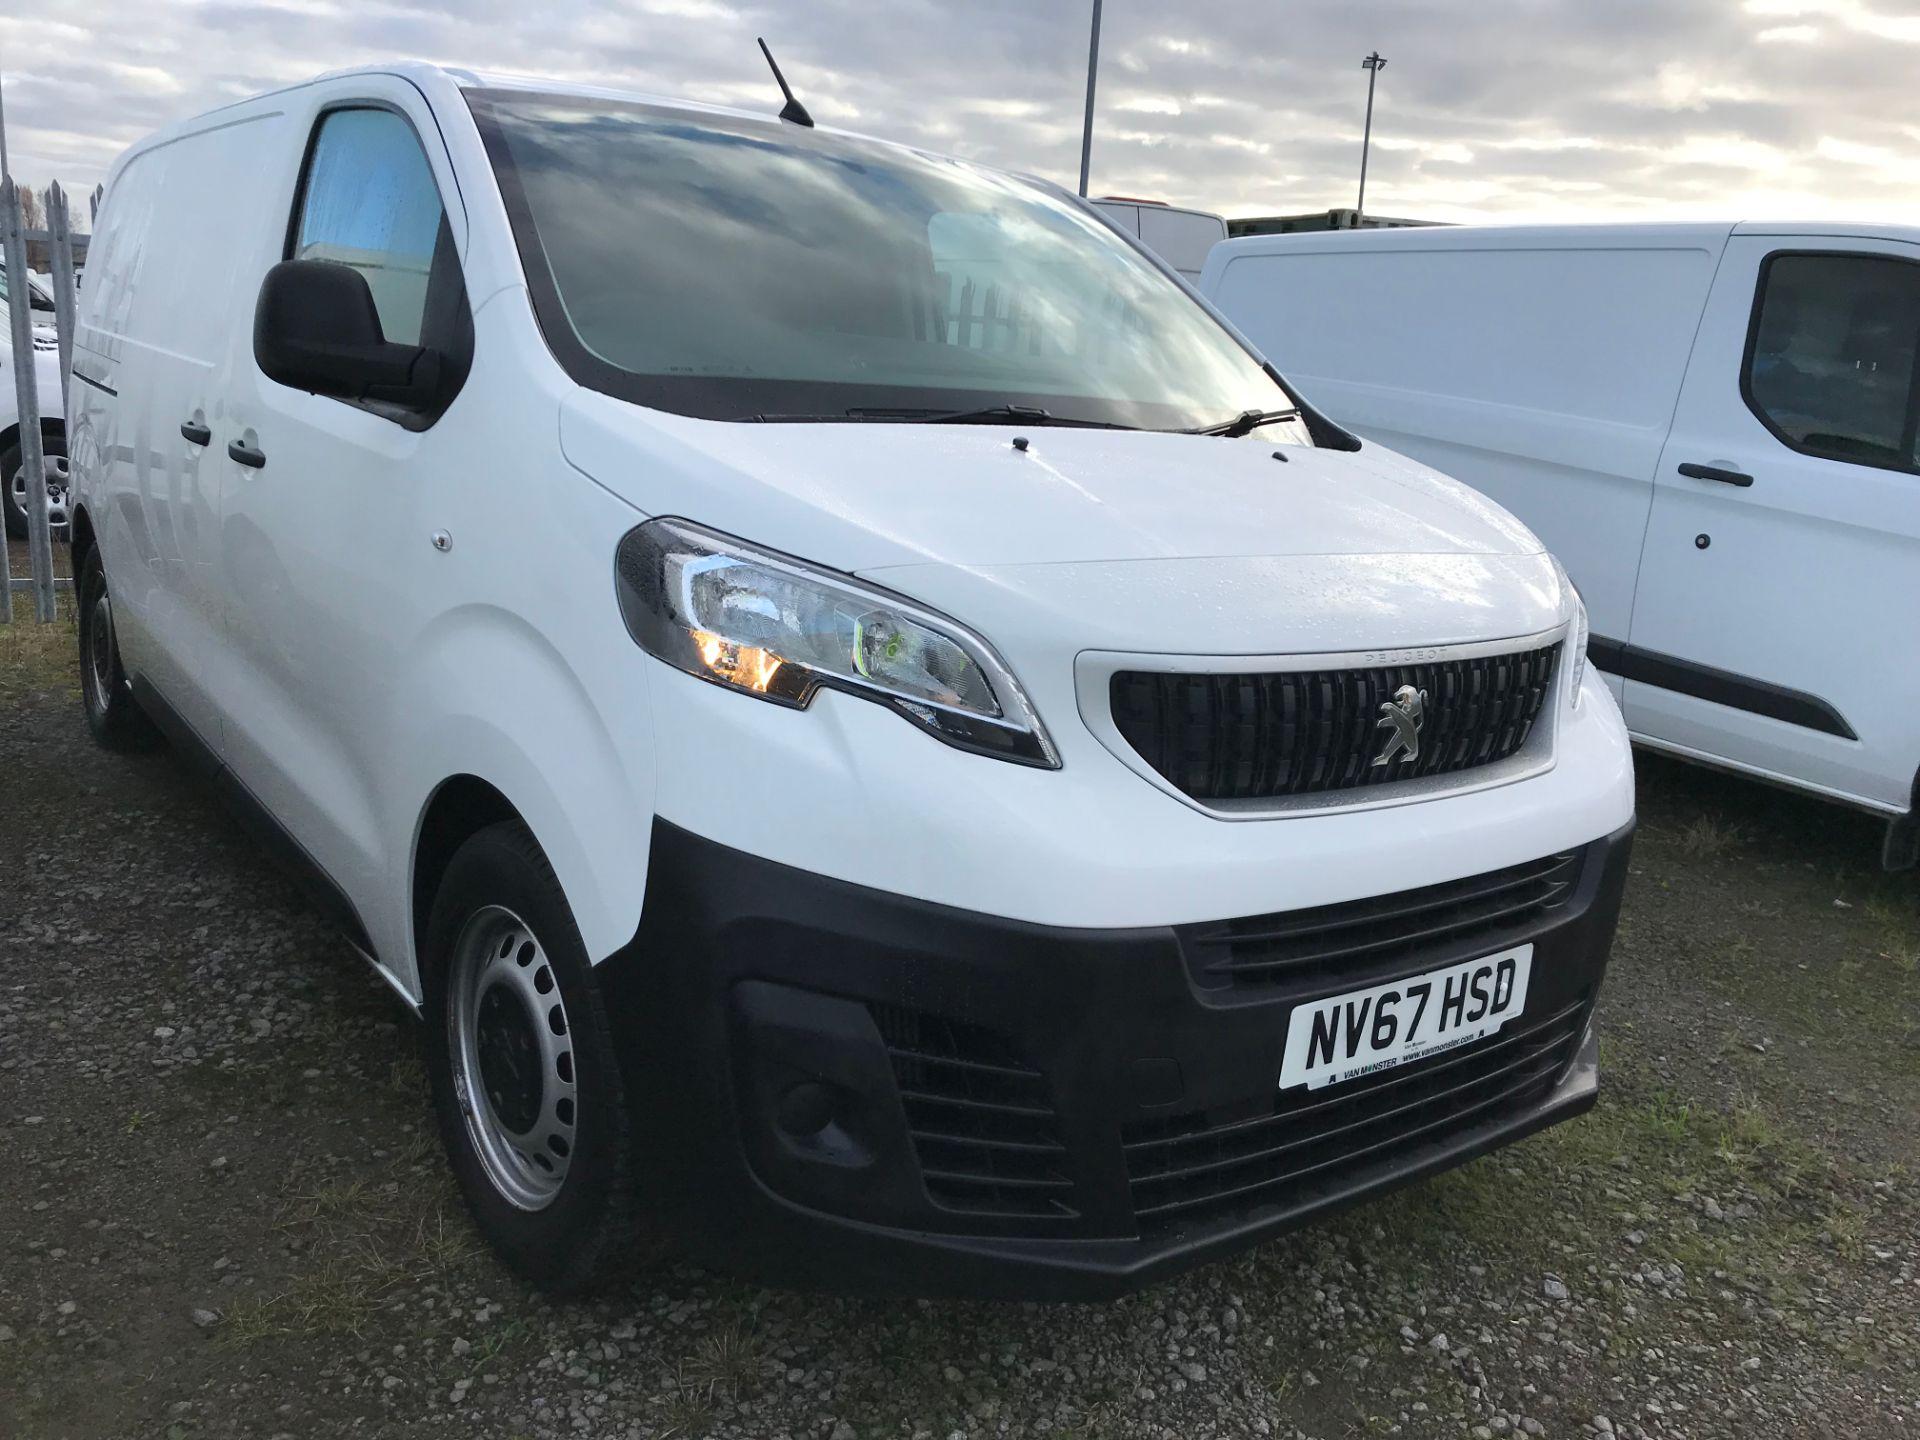 2018 Peugeot Expert 1000 1.6 Bluehdi 95 S Van (NV67HSD)